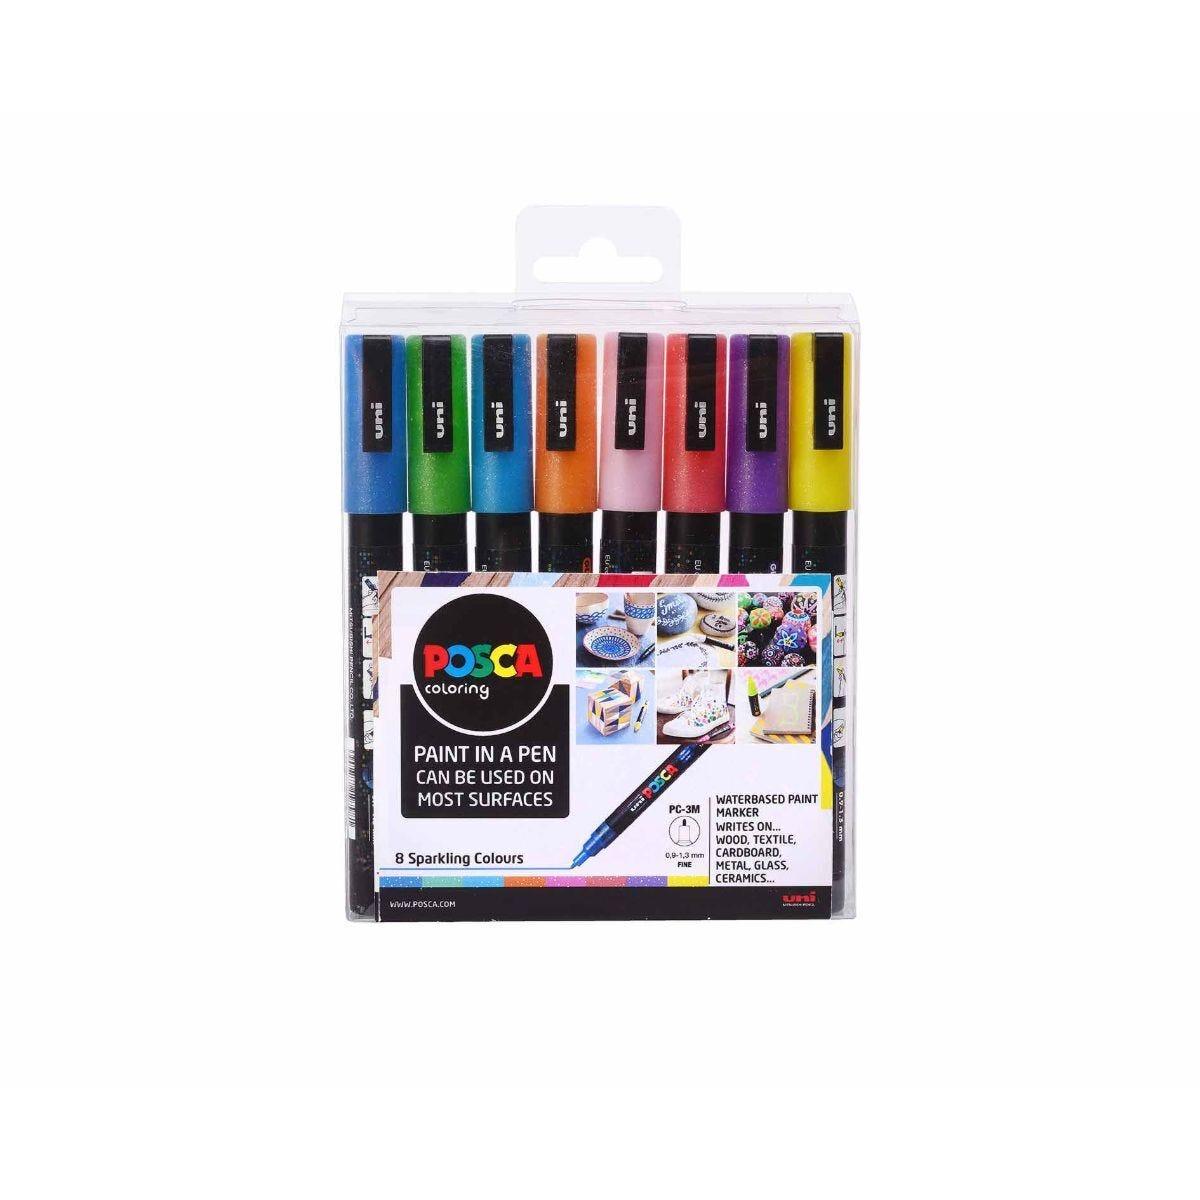 Uni Posca Marker Pen 0.9 - 1.3mm Bullet Tip PC-3ML Sparkling Pack of 8 Assorted